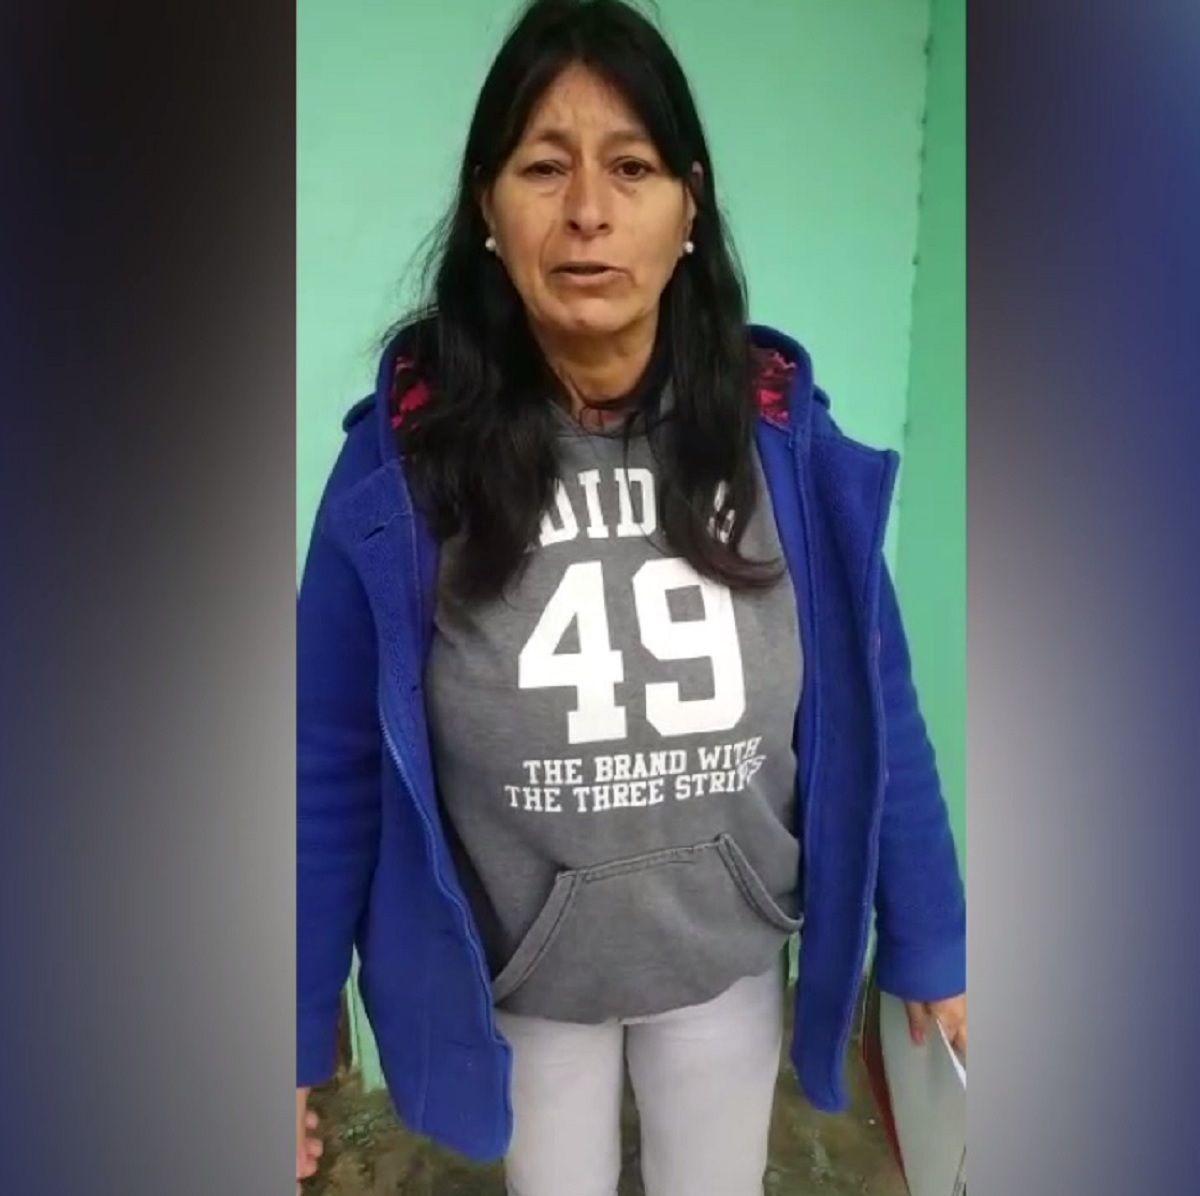 Celia Lescano